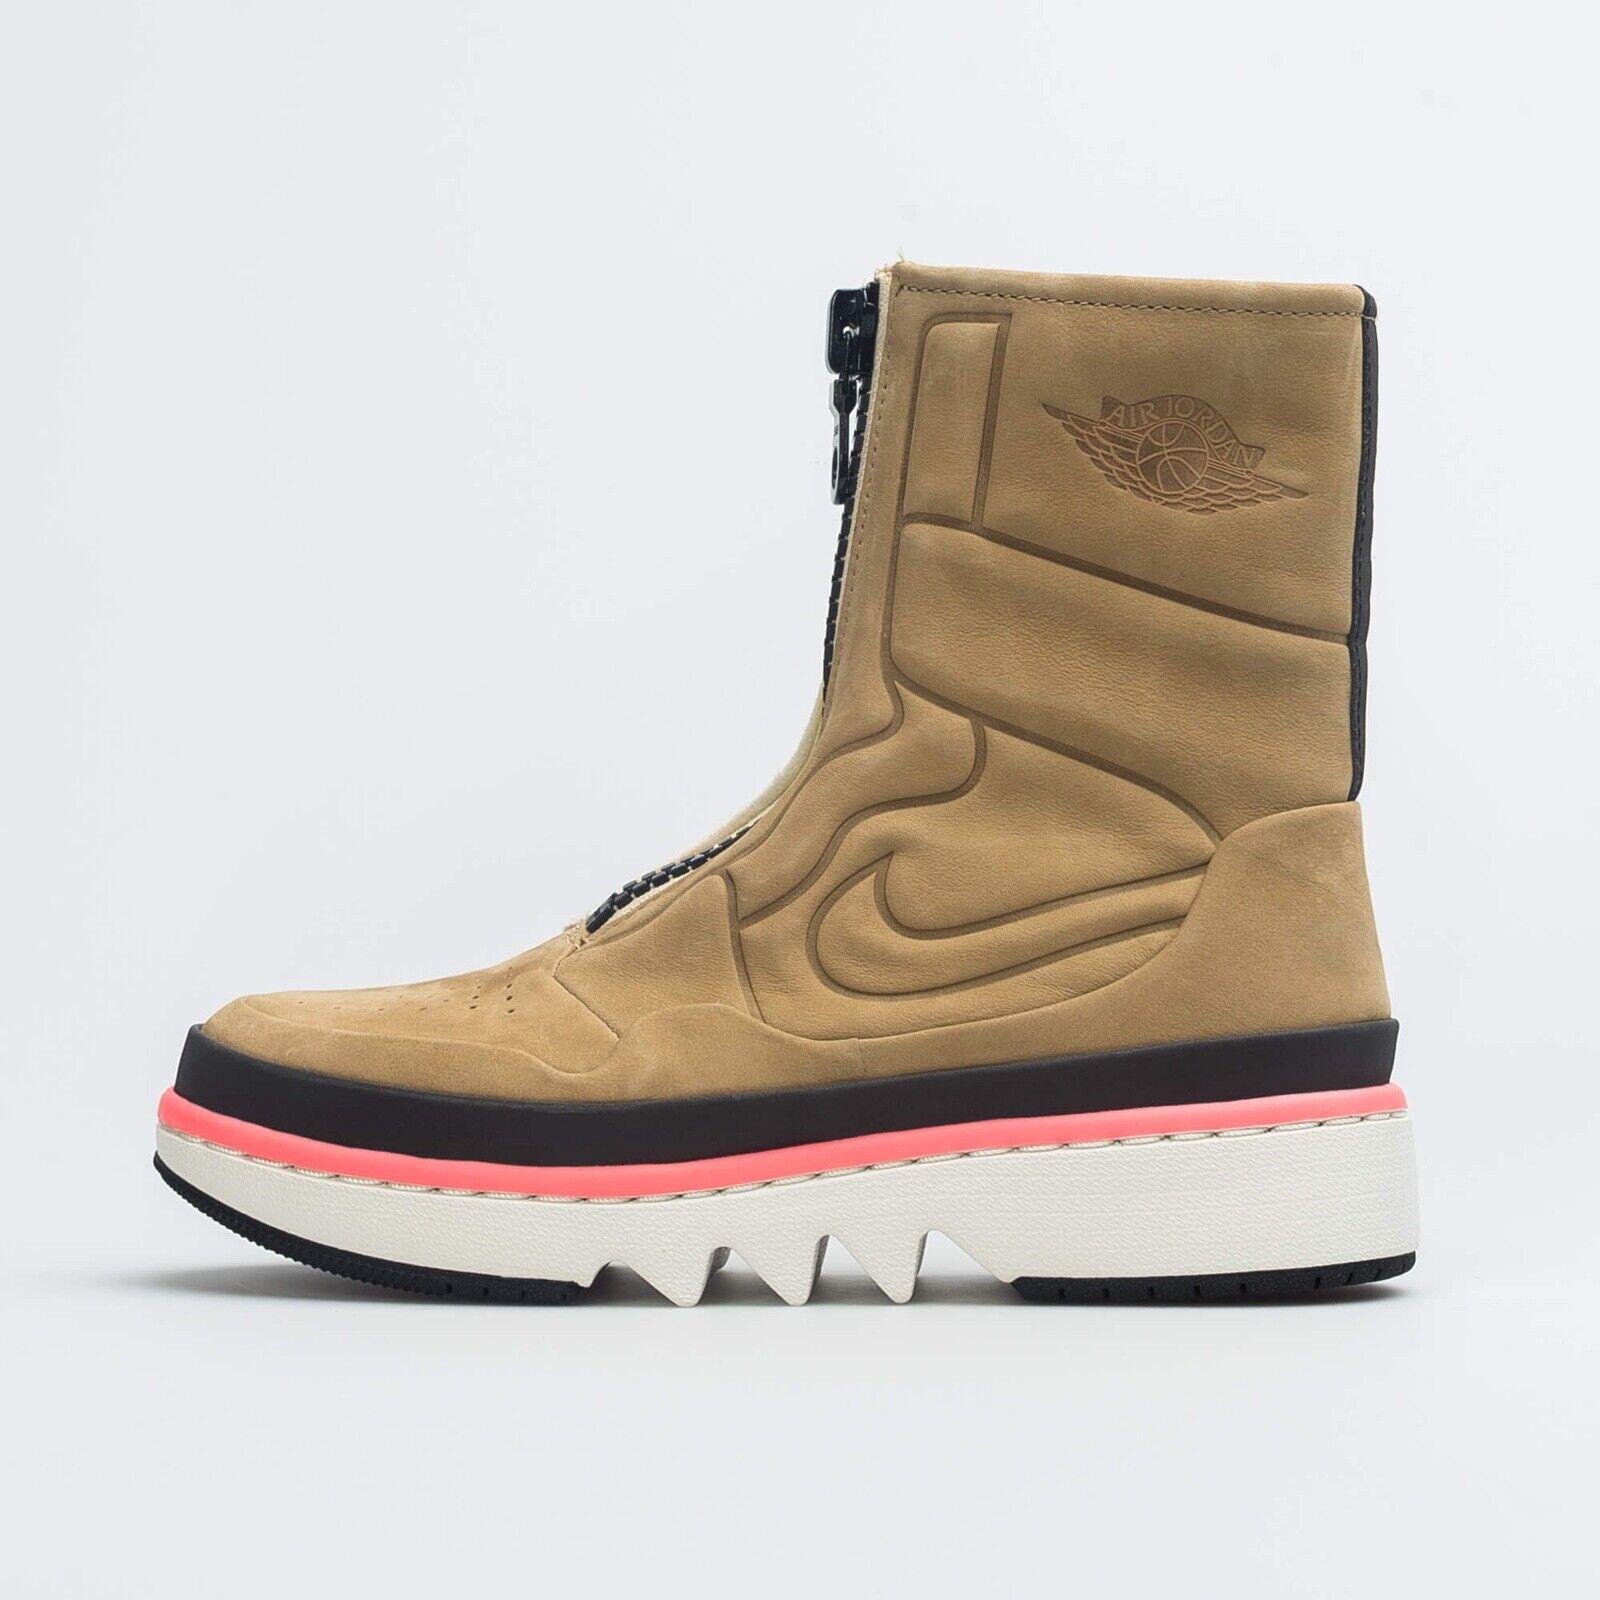 8 Neuf Nike Air Jordan 1 Bouffon Xx Utilitaire Paquet Bottes mi-Mollet Daim